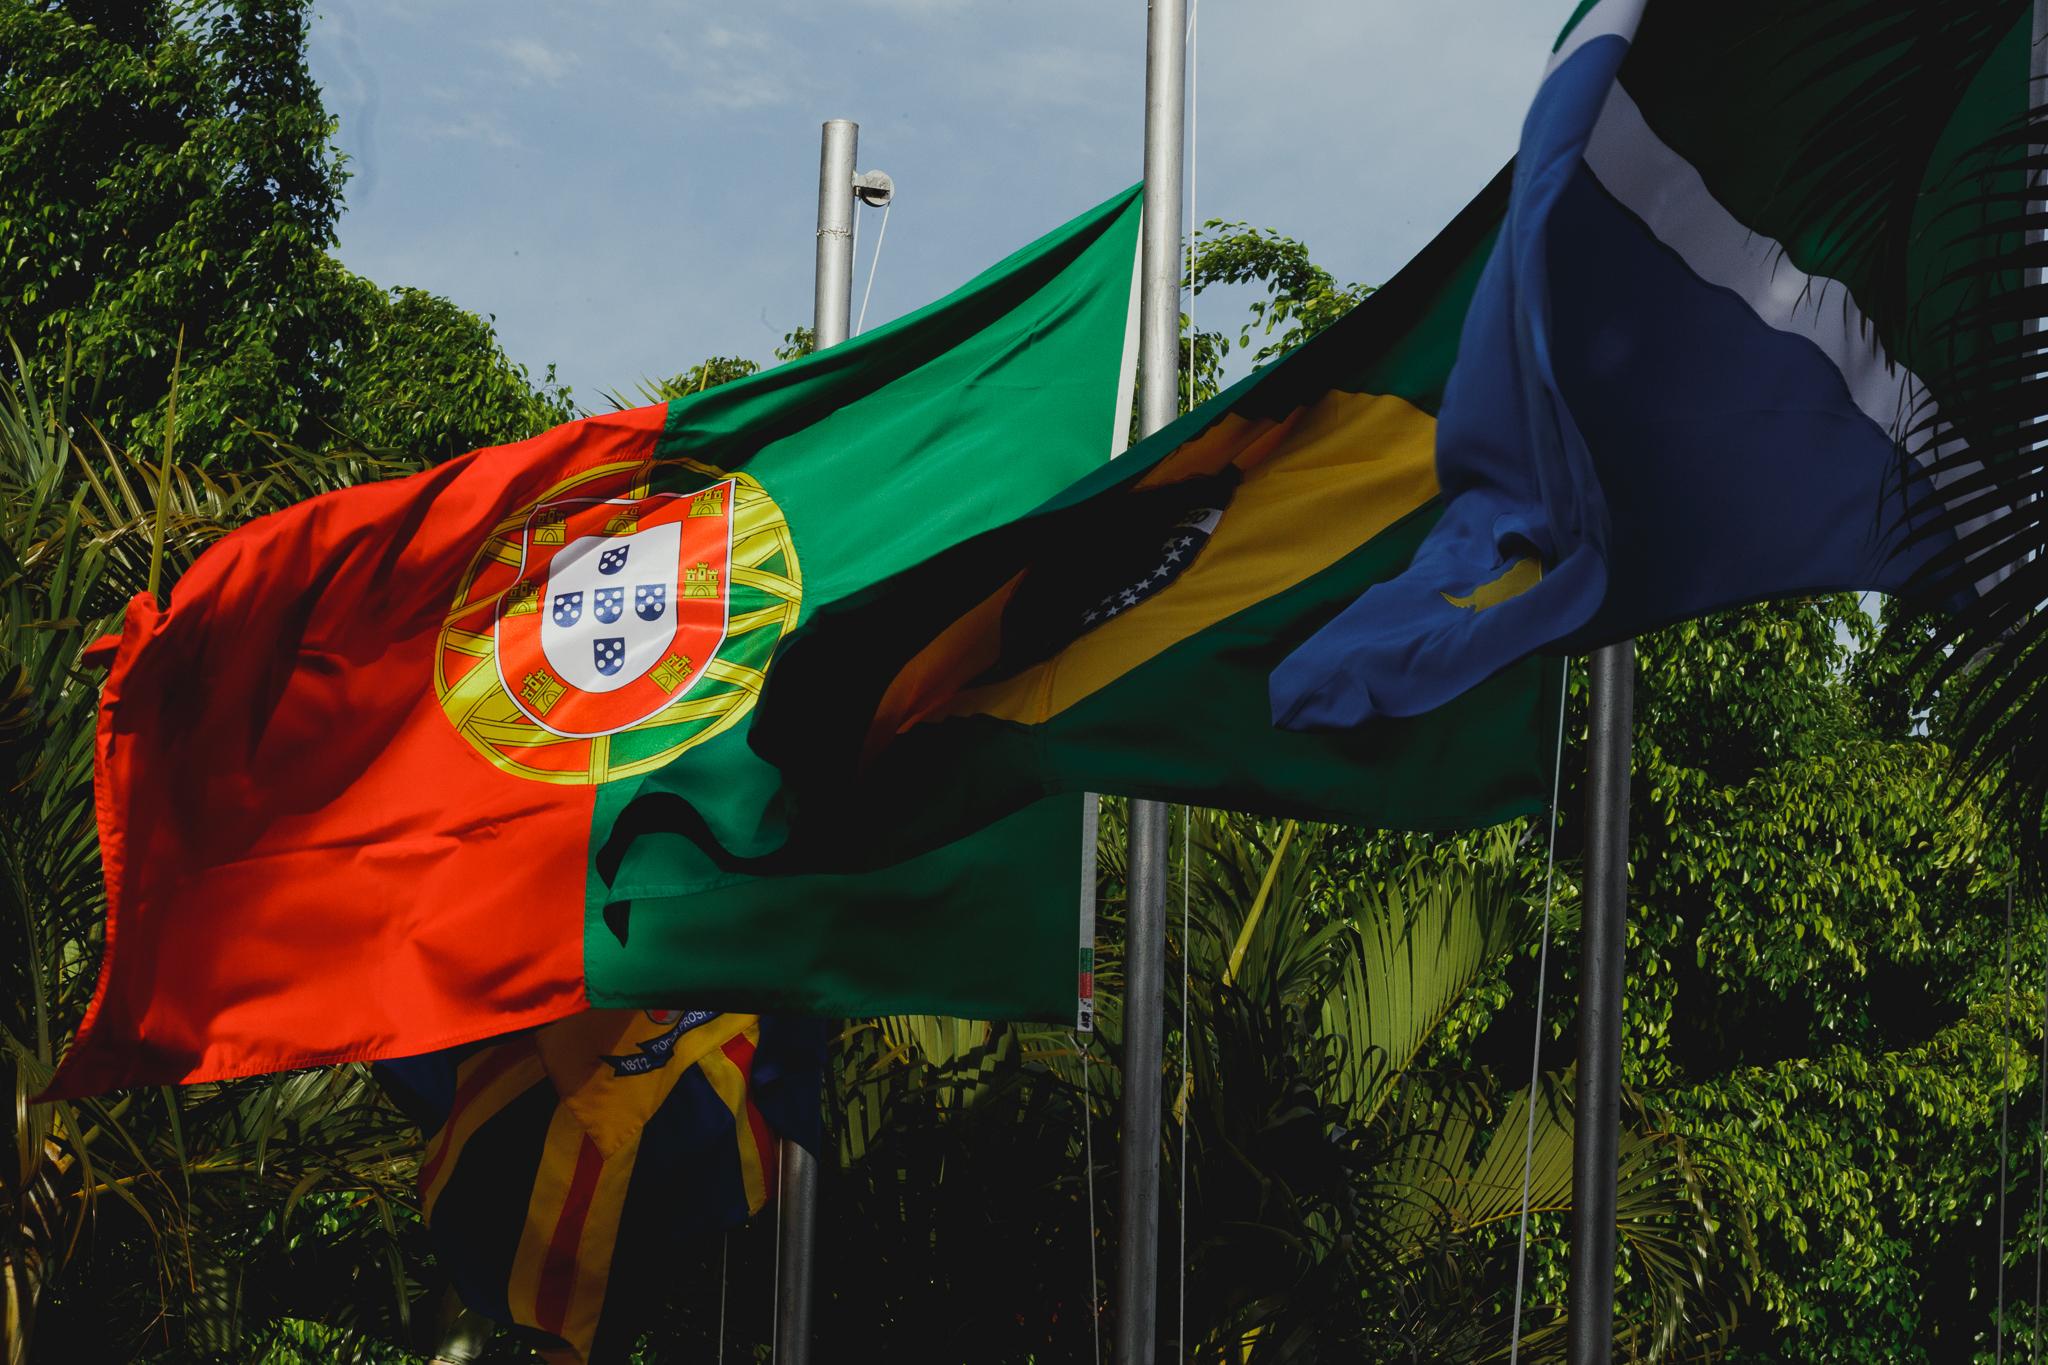 Hino Nacional Português